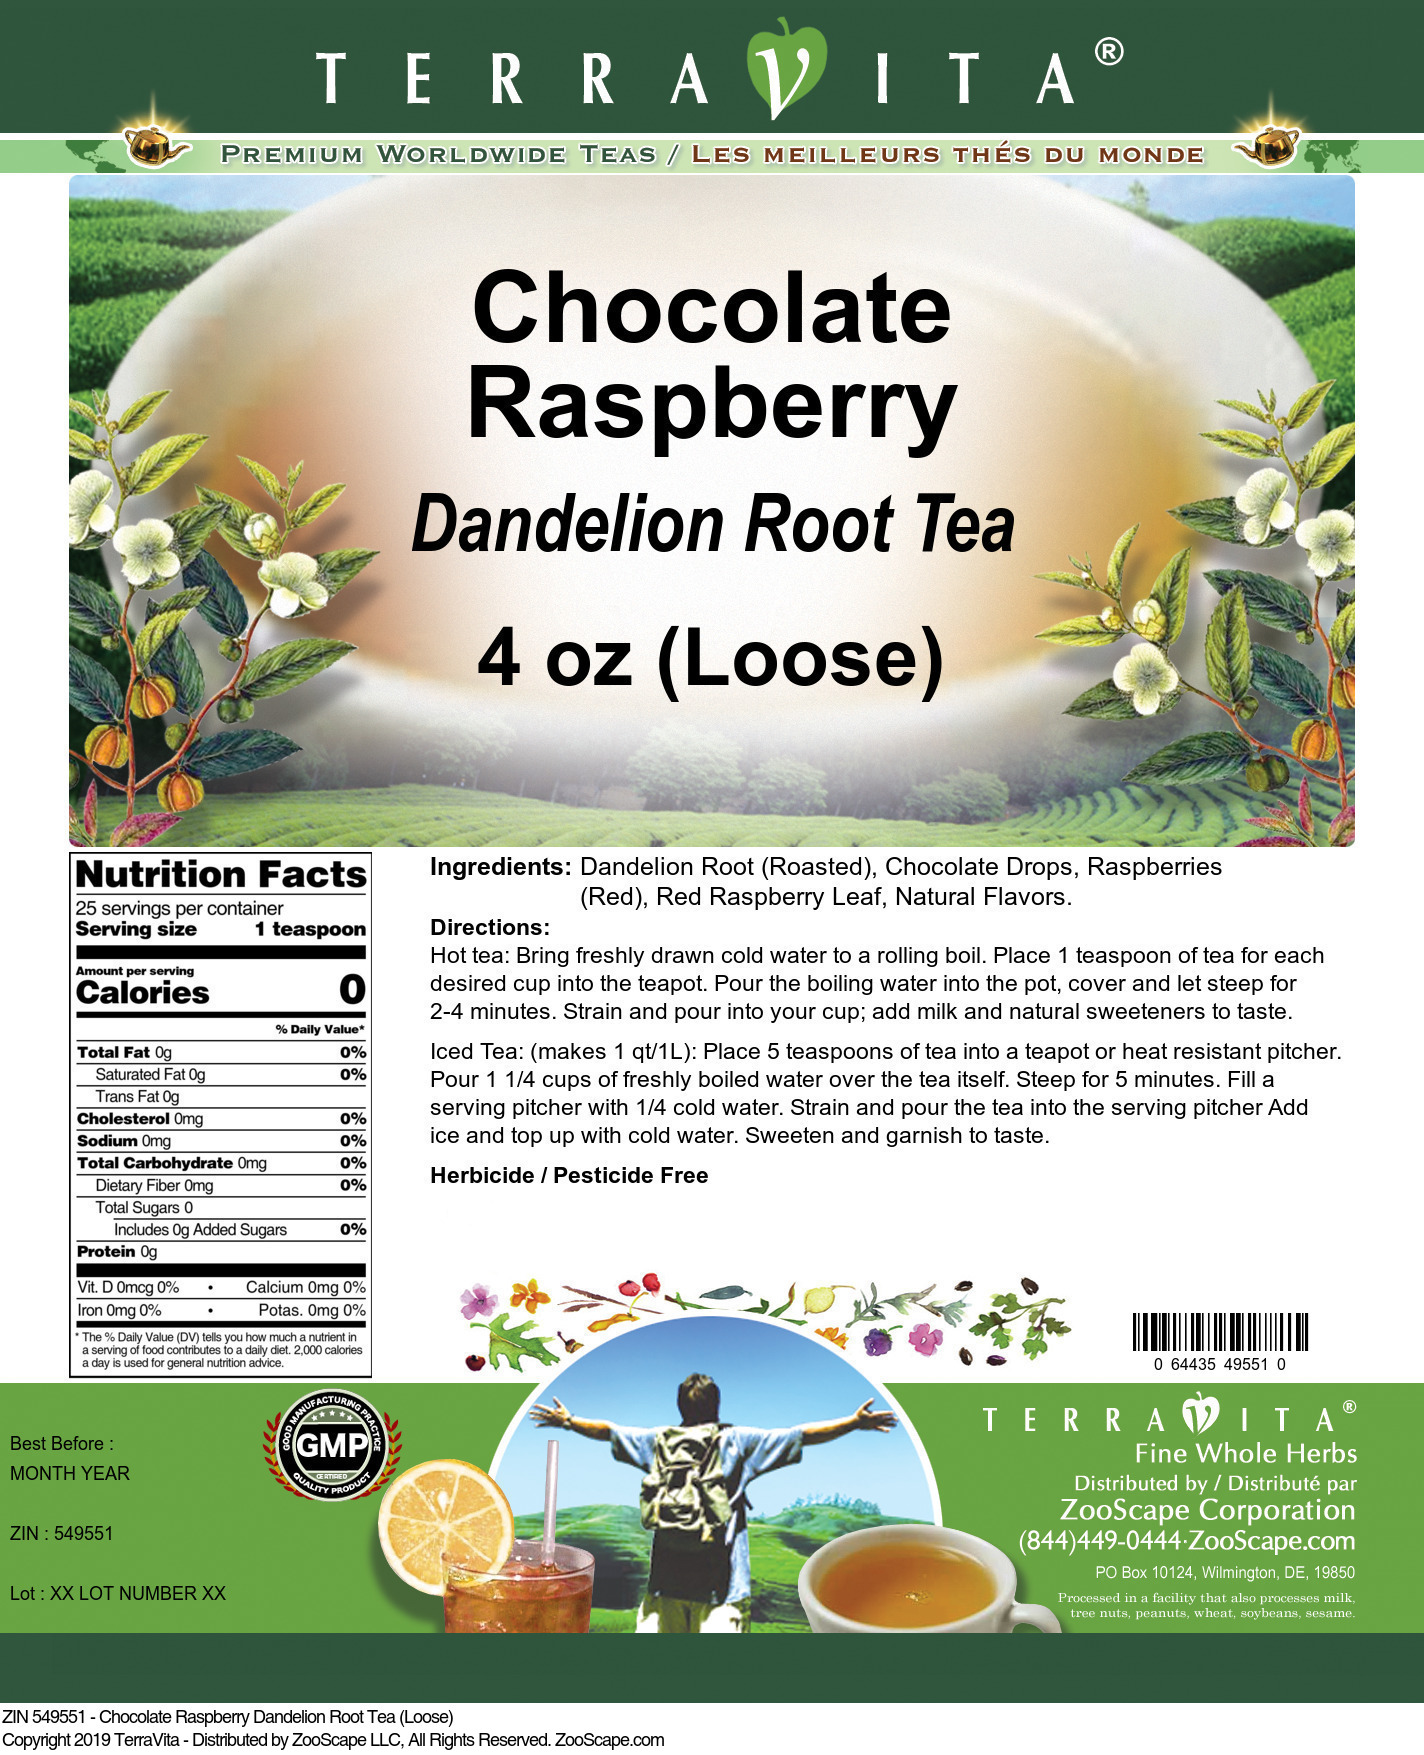 Chocolate Raspberry Dandelion Root Tea (Loose)